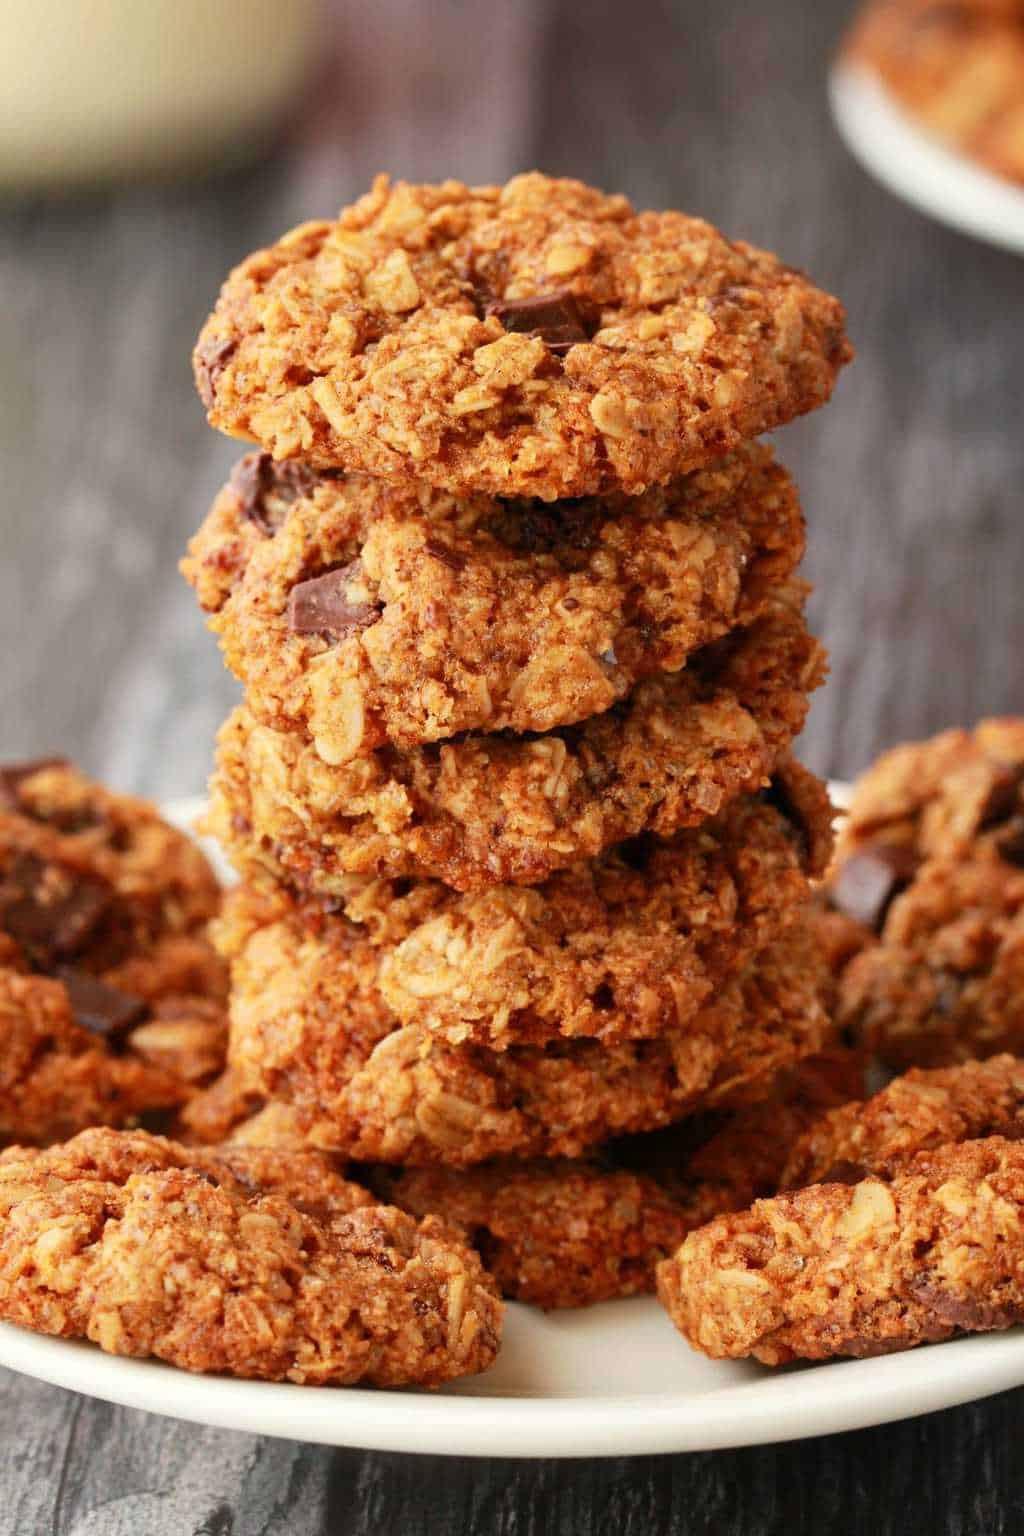 Vegan Oatmeal Chocolate Chip Cookies  Vegan Oatmeal Chocolate Chip Cookies Loving It Vegan